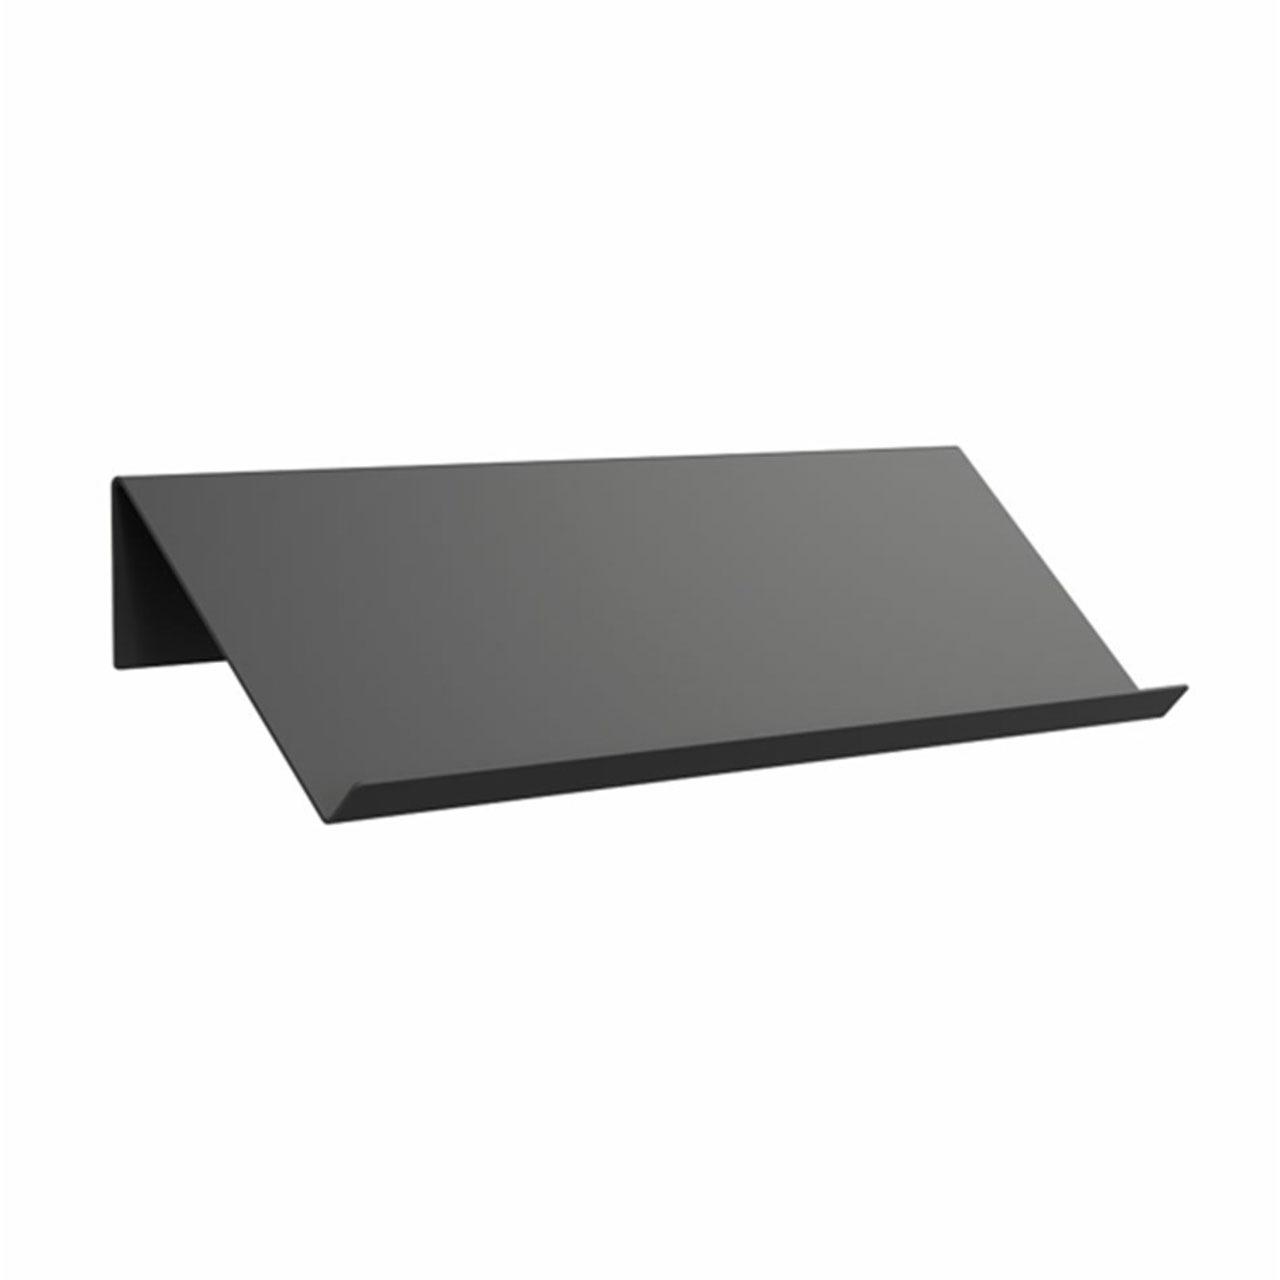 Frost Schuh-/Magazinregal   Matt schwarz,  100 cm